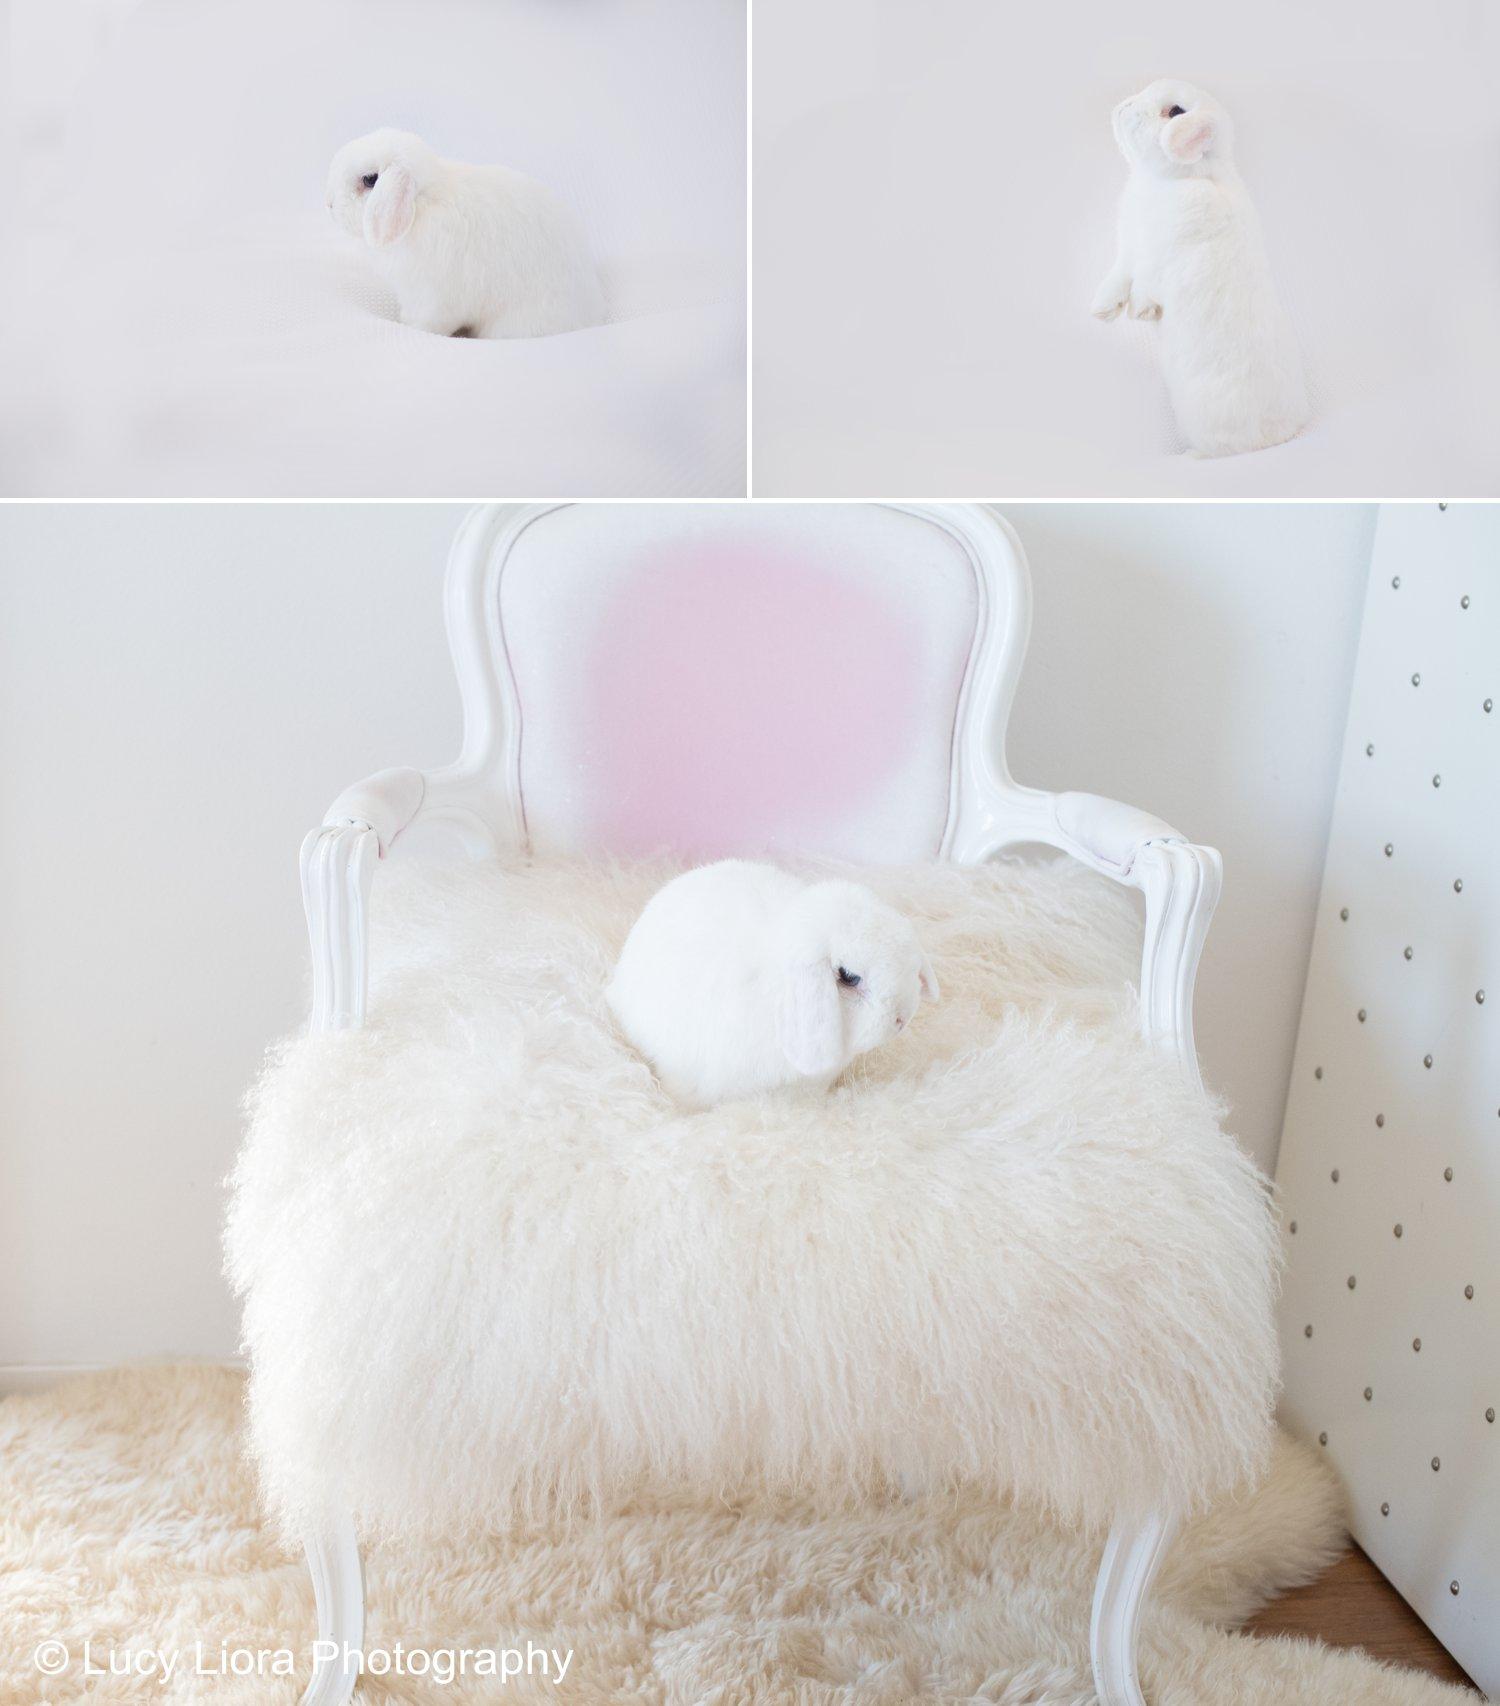 san-gabriel-valley-pet-photographer-bunny-3